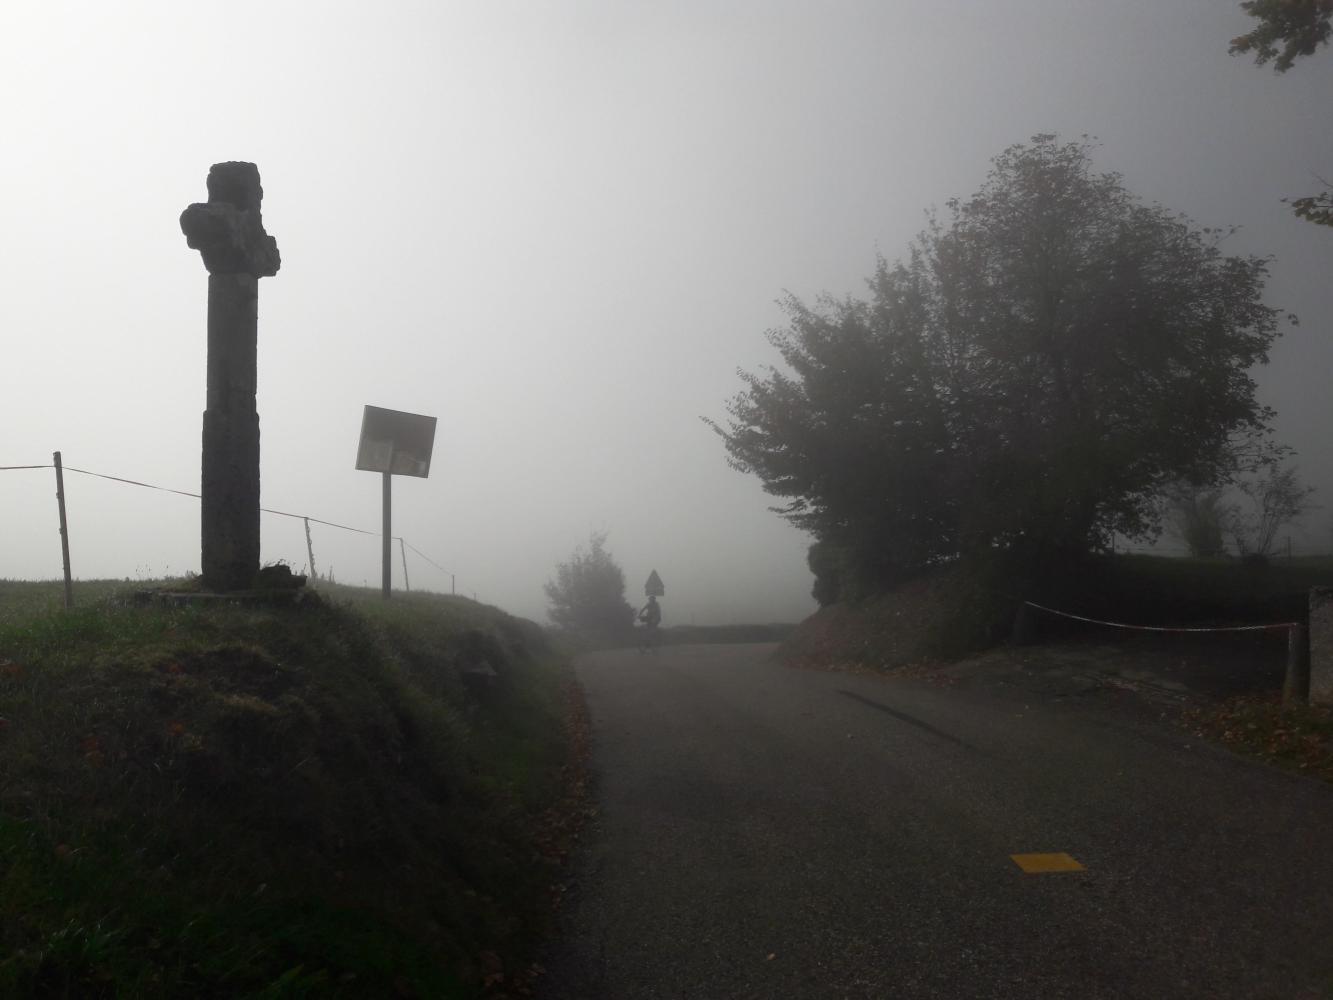 Col de Croix South Bike Climb - PJAMM Cycling